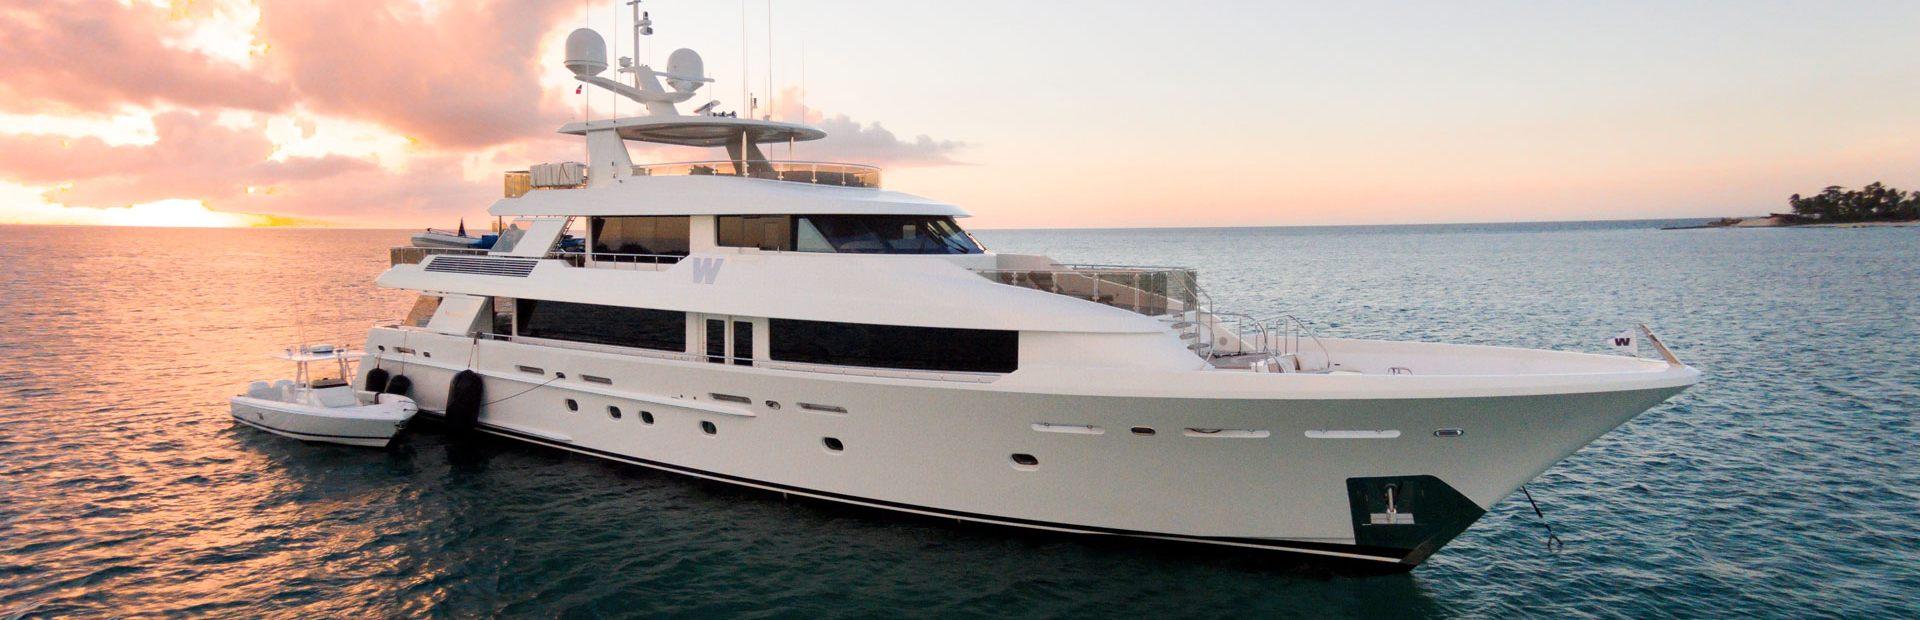 Westport 130 Yacht Charter